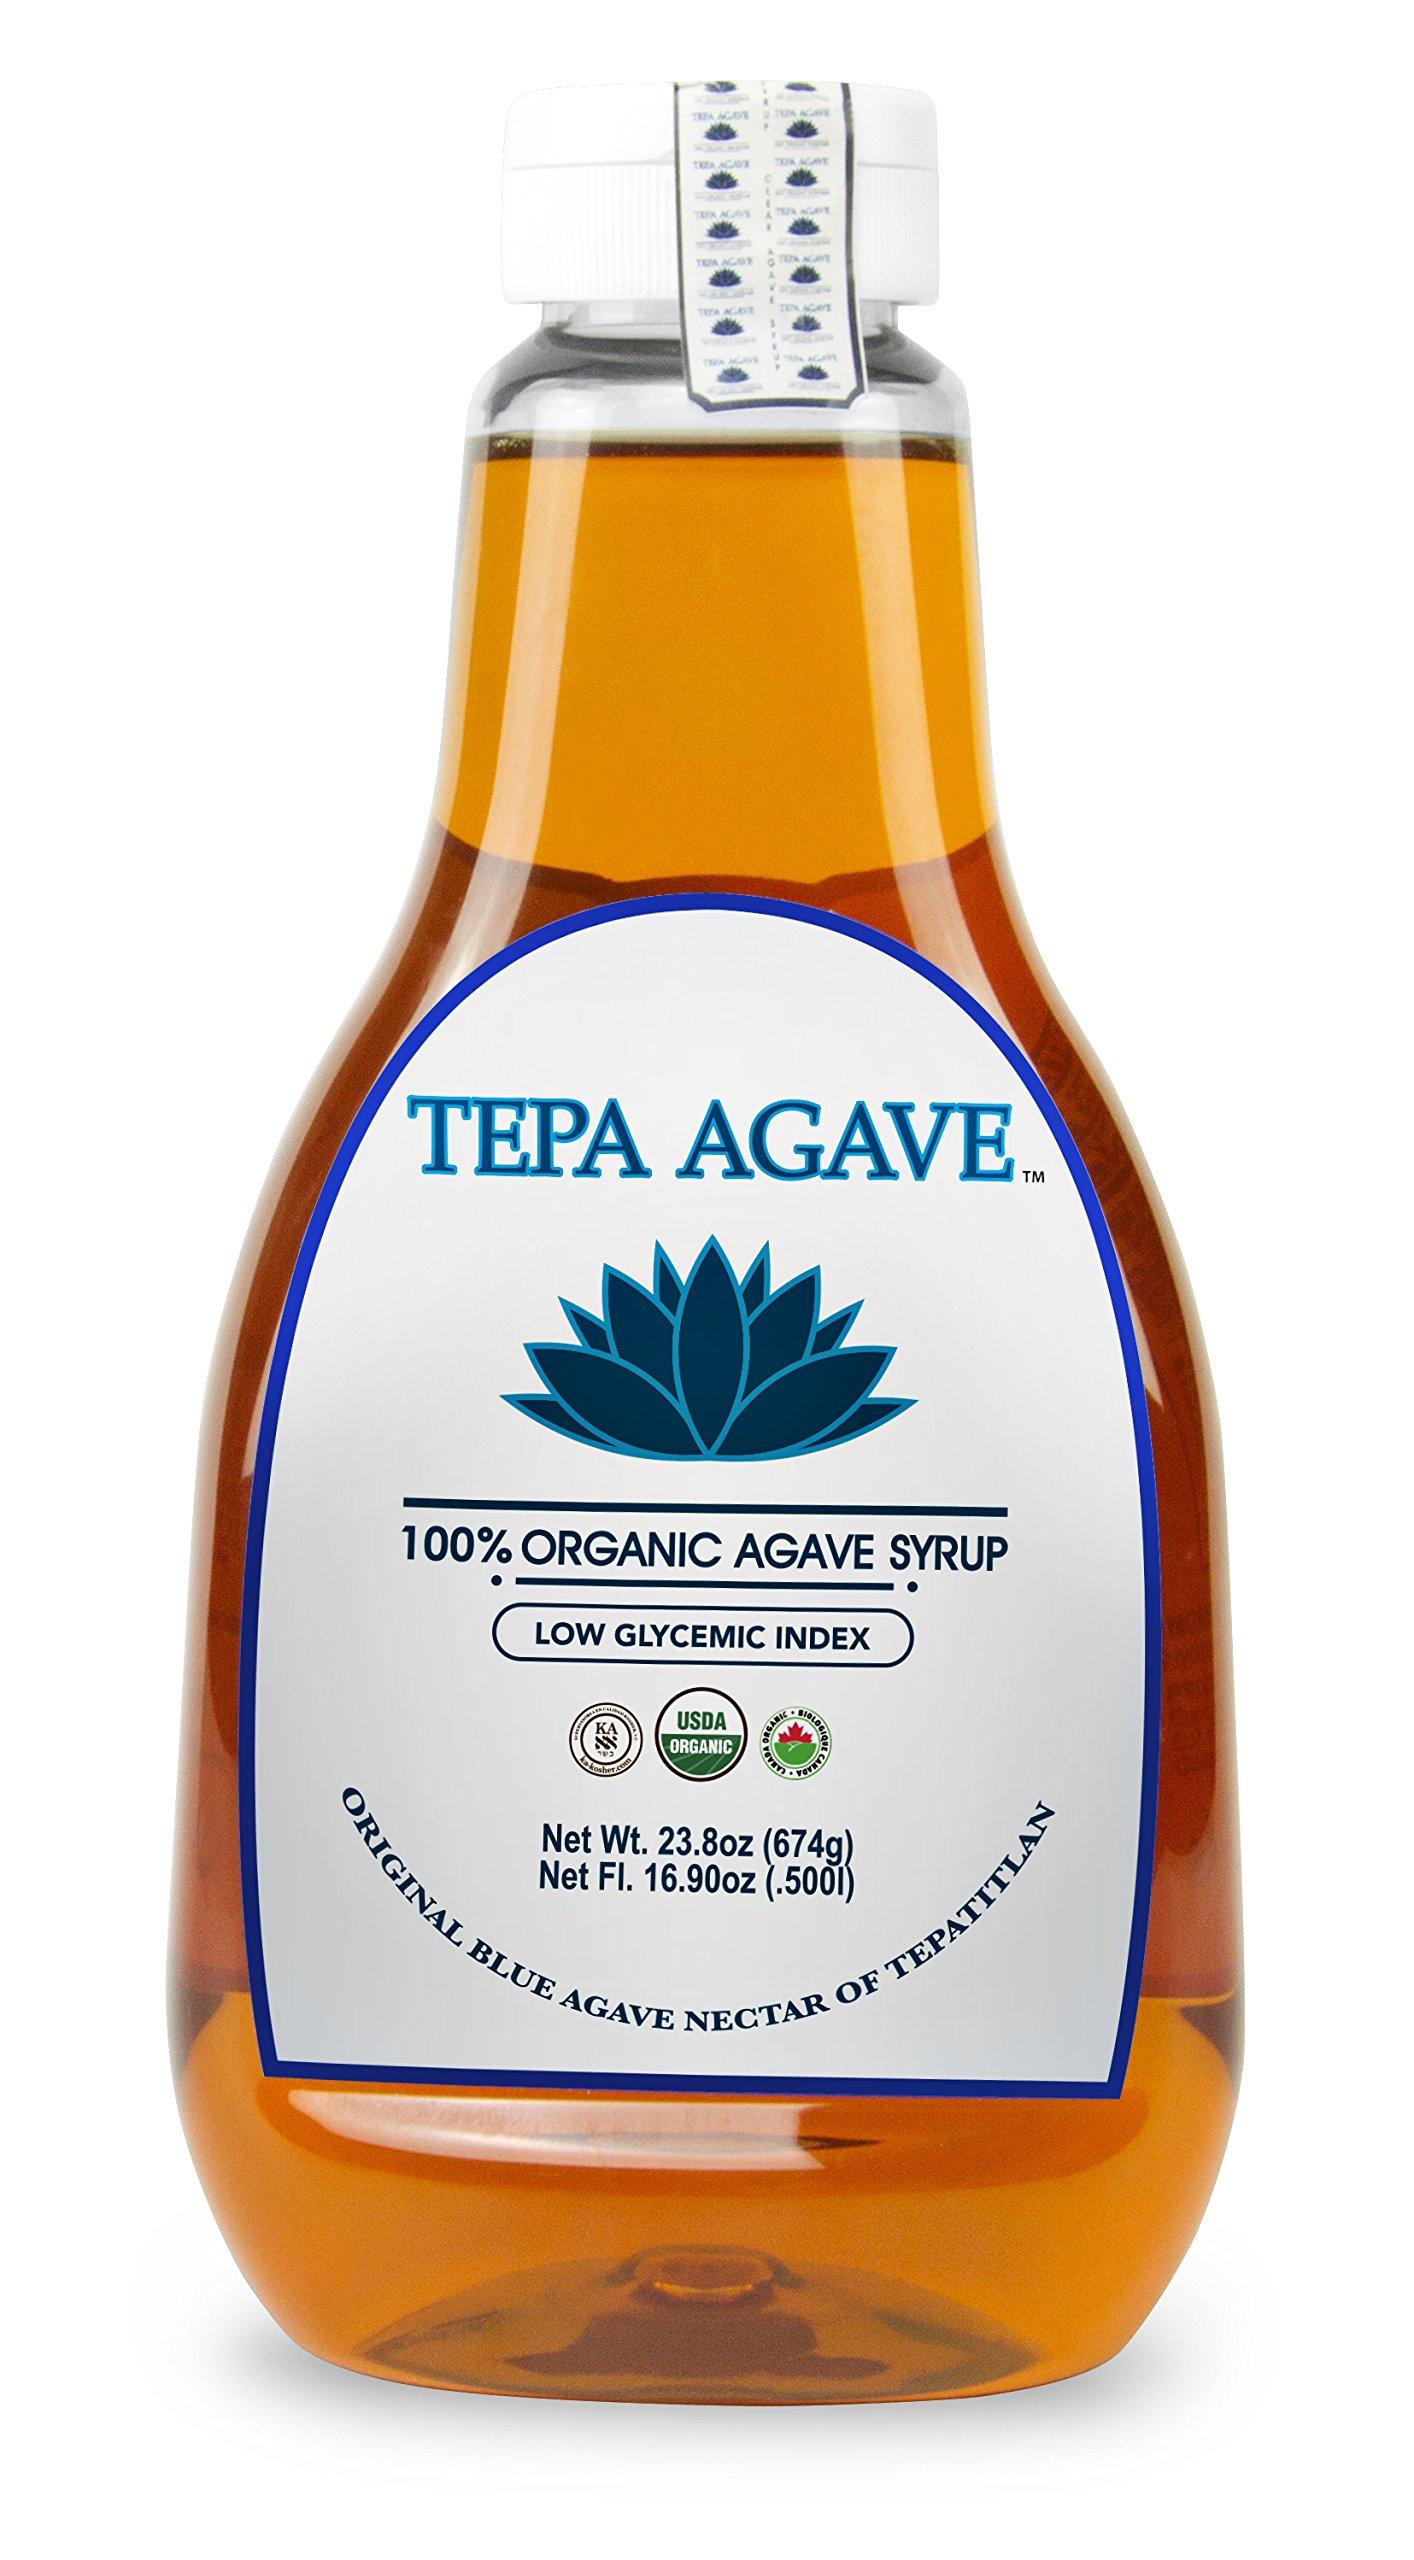 Tepa Agave 100% Pure Organic Blue Agave Syrup - Original Agave Flavor - 23.8 oz